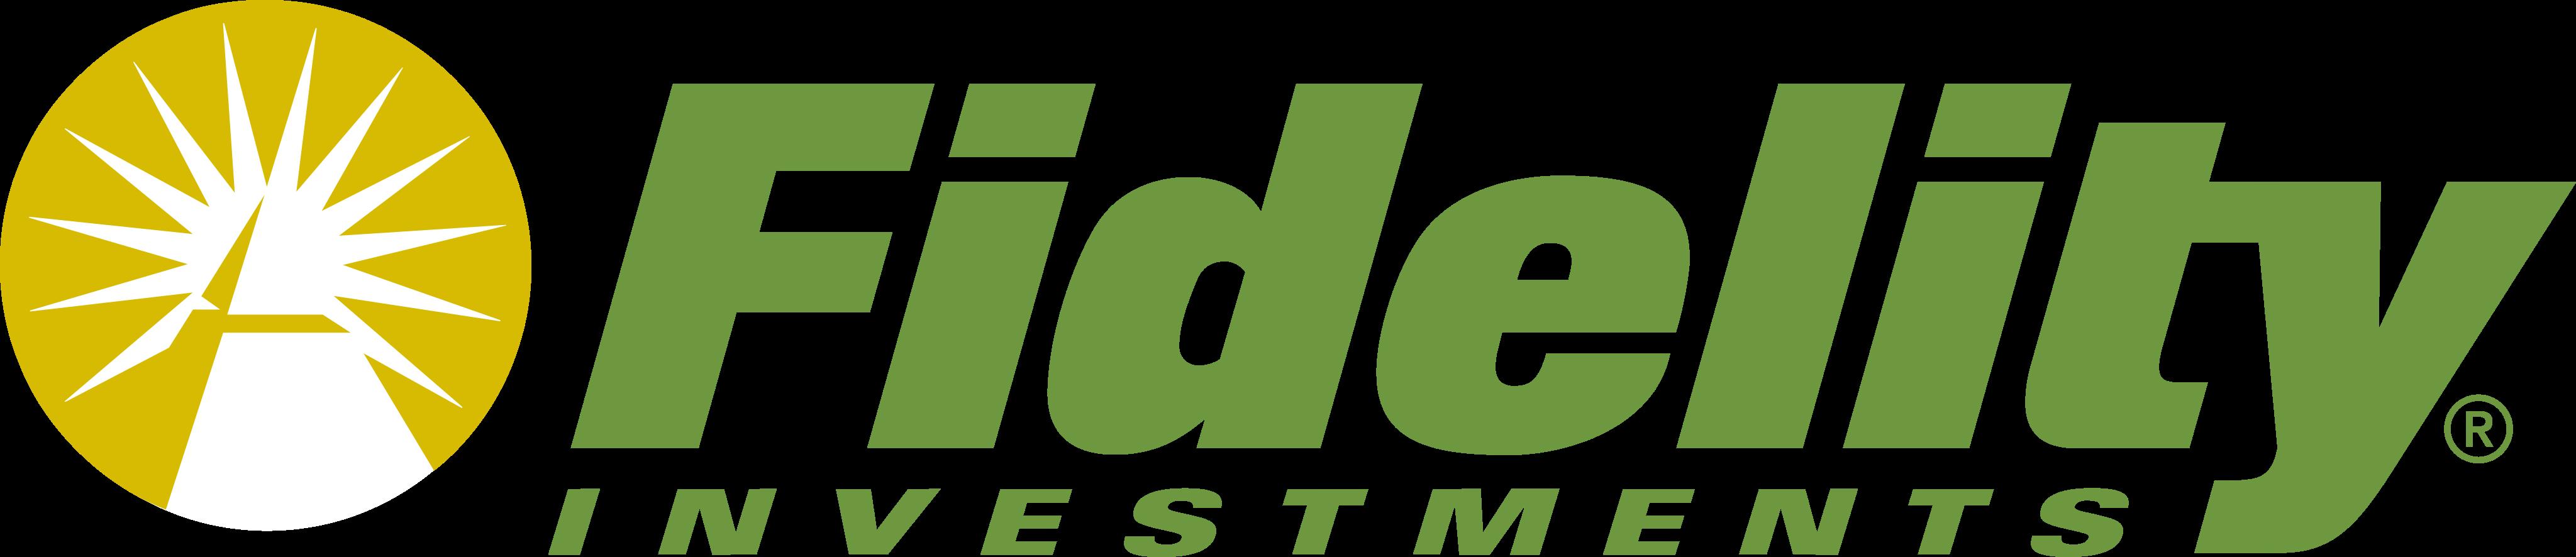 fidelity investments logo 1 - Fidelity Investments Logo